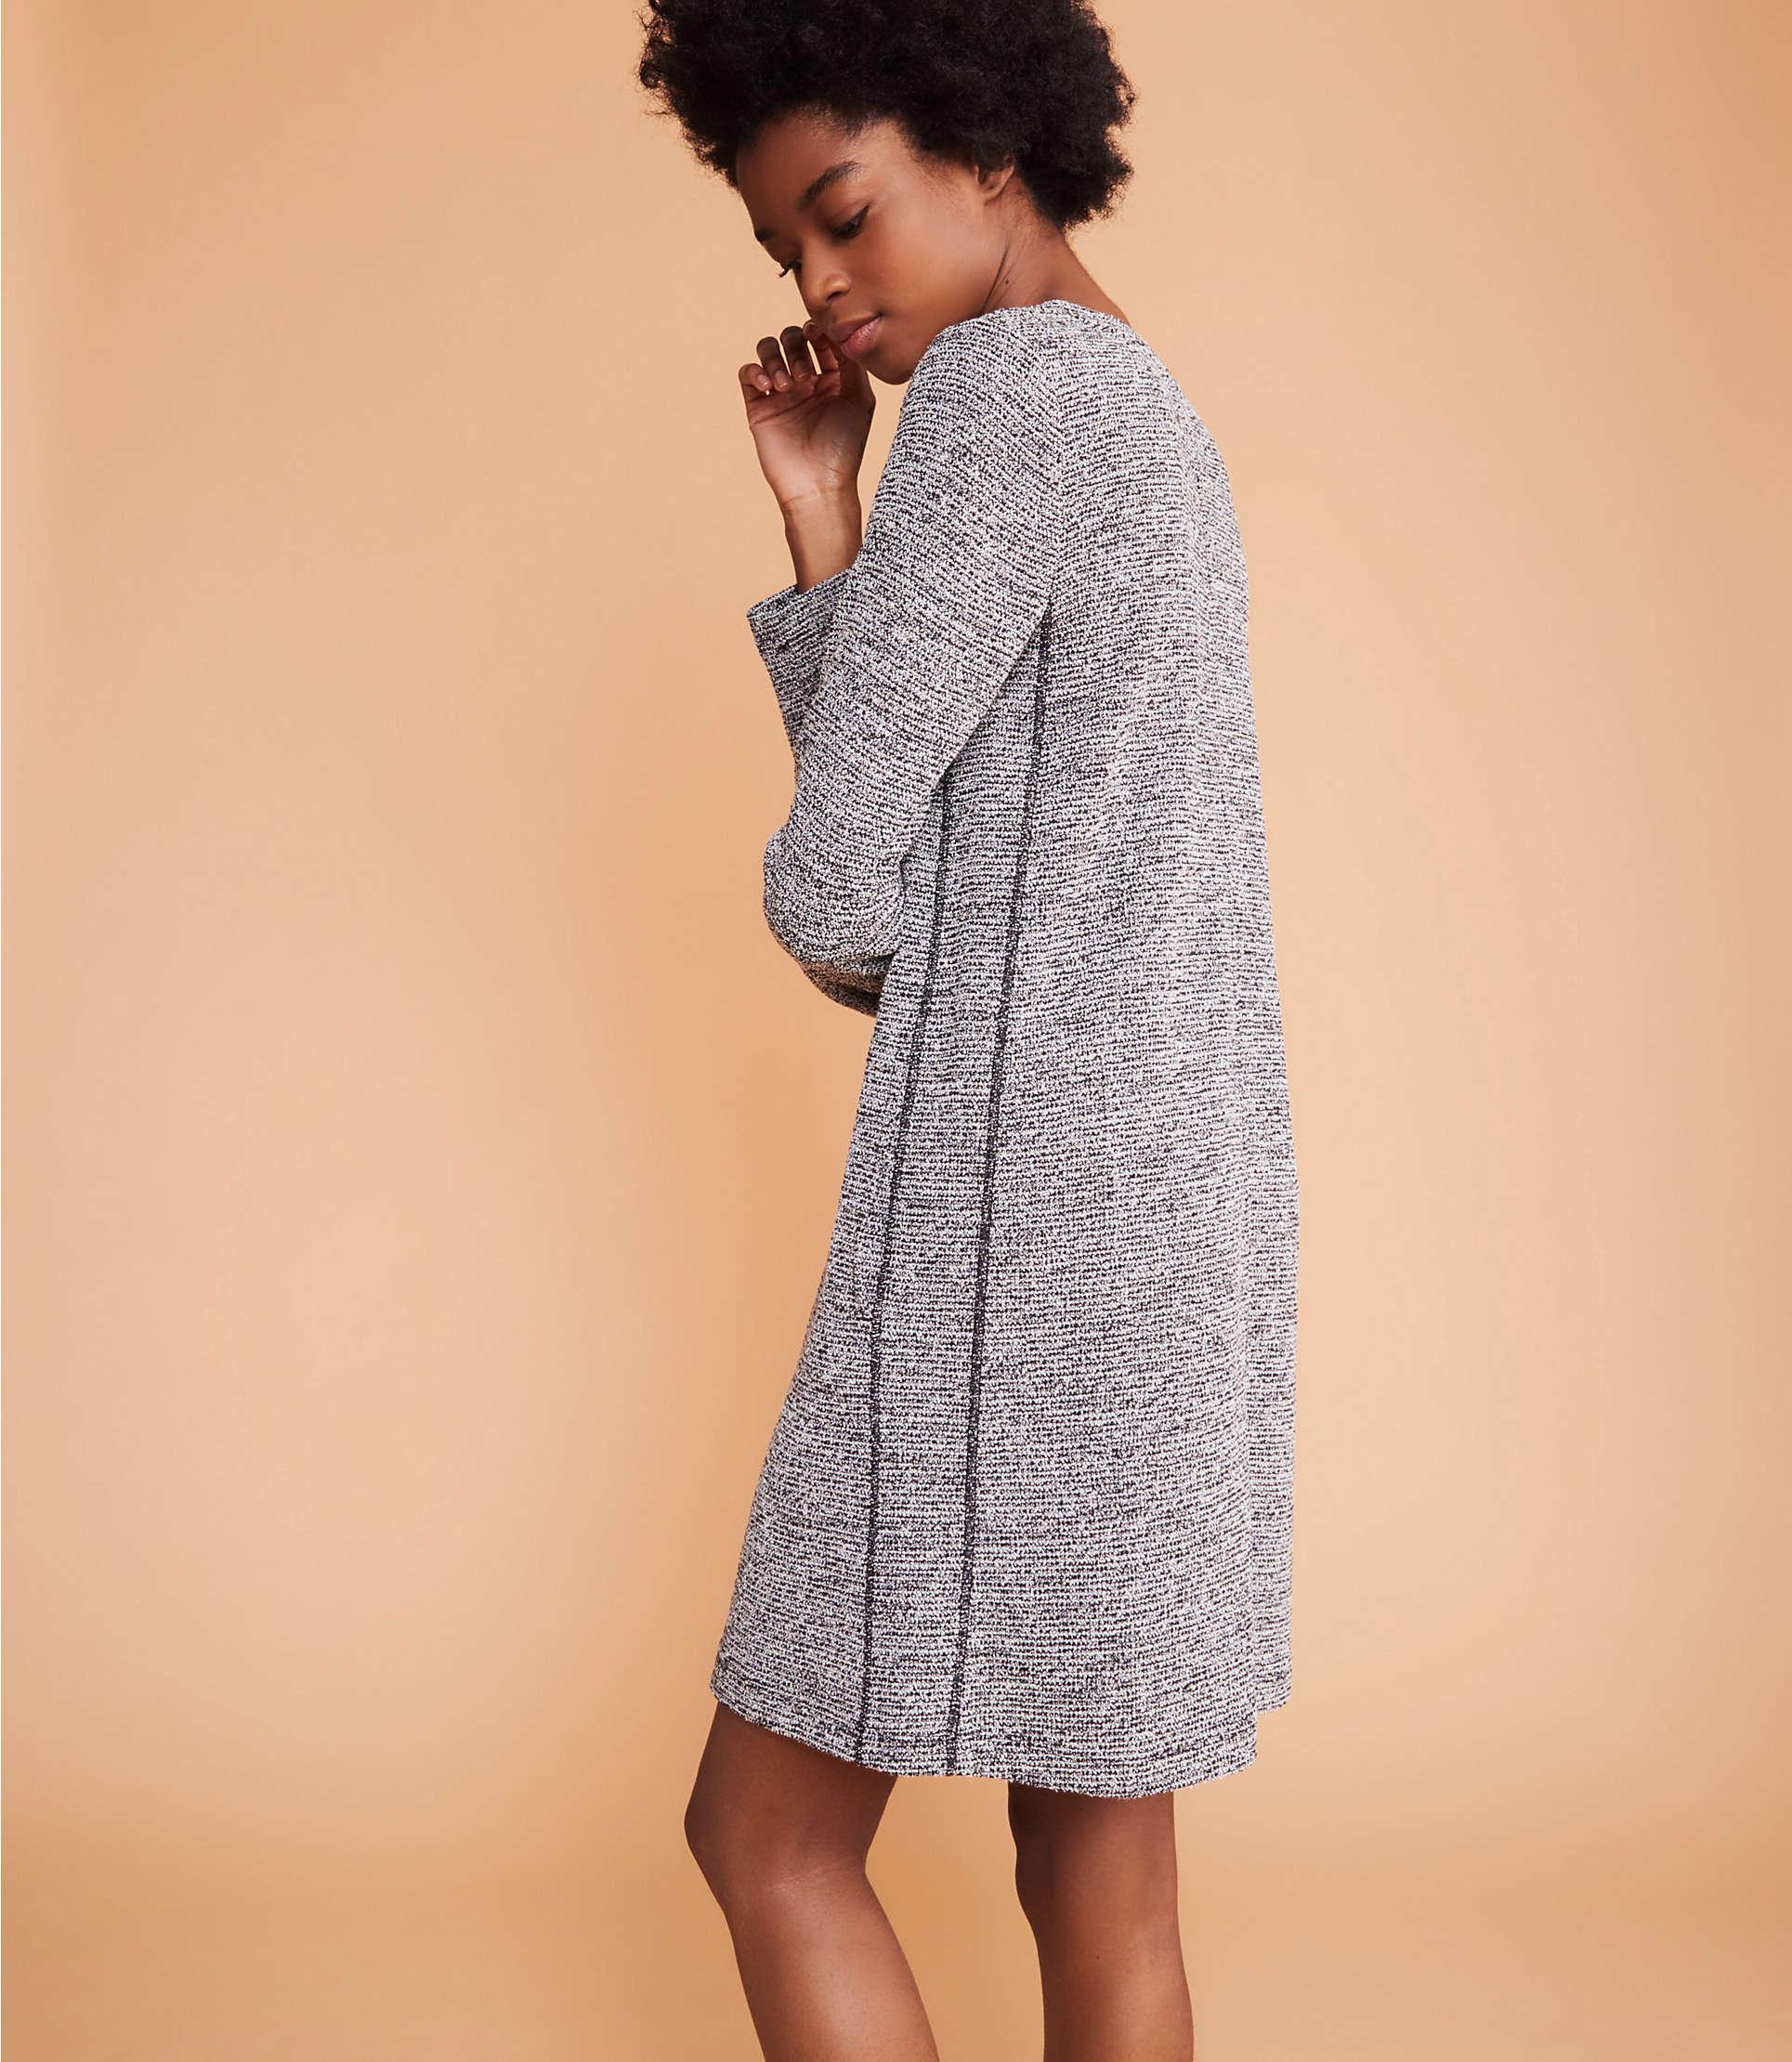 25885256ce5 LOFT - Gray Lou   Grey Boucle Tweed Pocket Dress - Lyst. View fullscreen